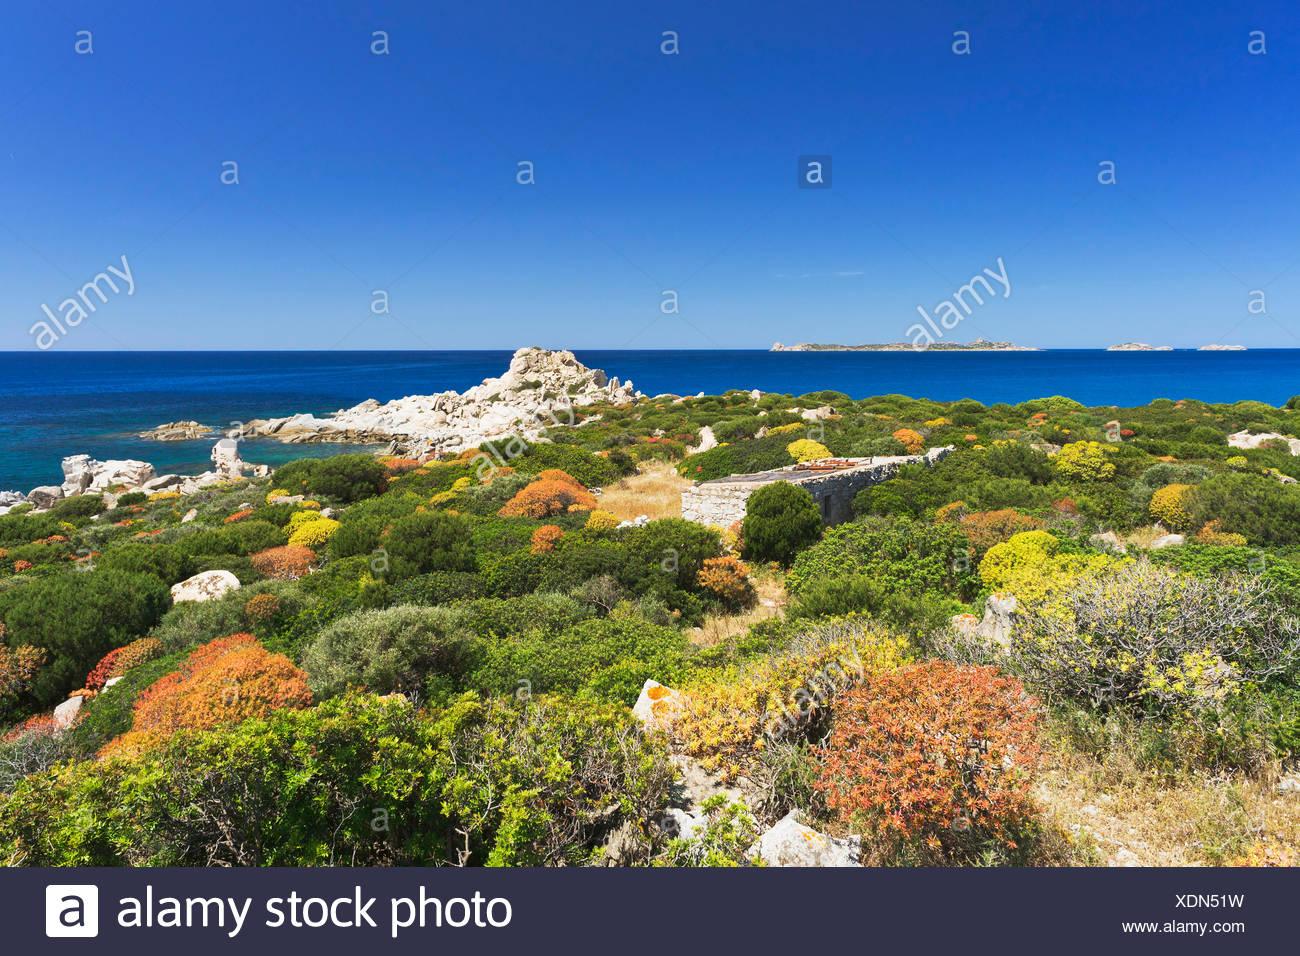 House and Macchia shrubland on the beach of Punta Molentis, Villasimius, Sarrabus, Cagliari province, Sardinia, Italy, Europe - Stock Image